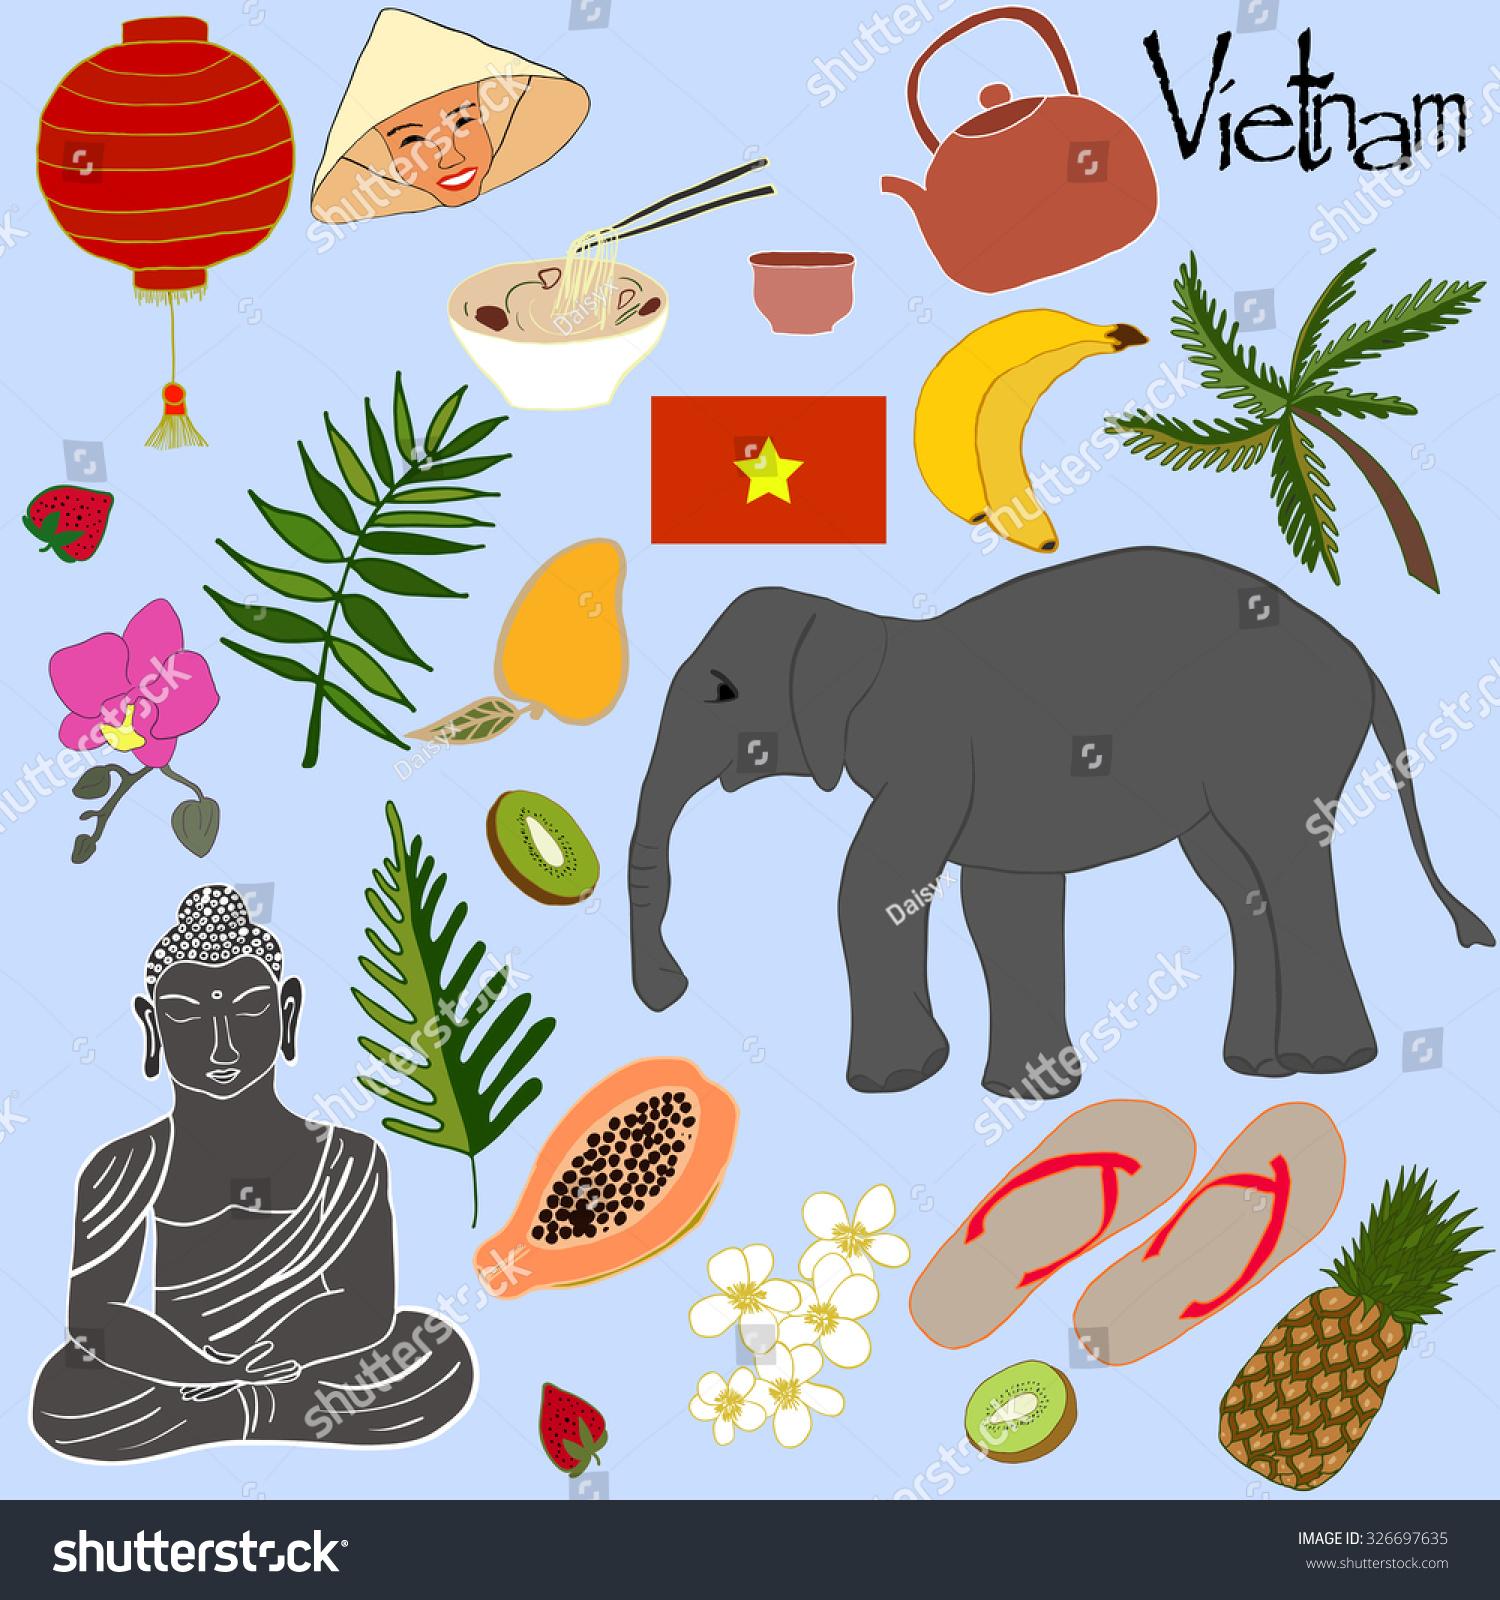 Doodled Symbols Vietnam Vector Vietnam Symbols Stock Vector